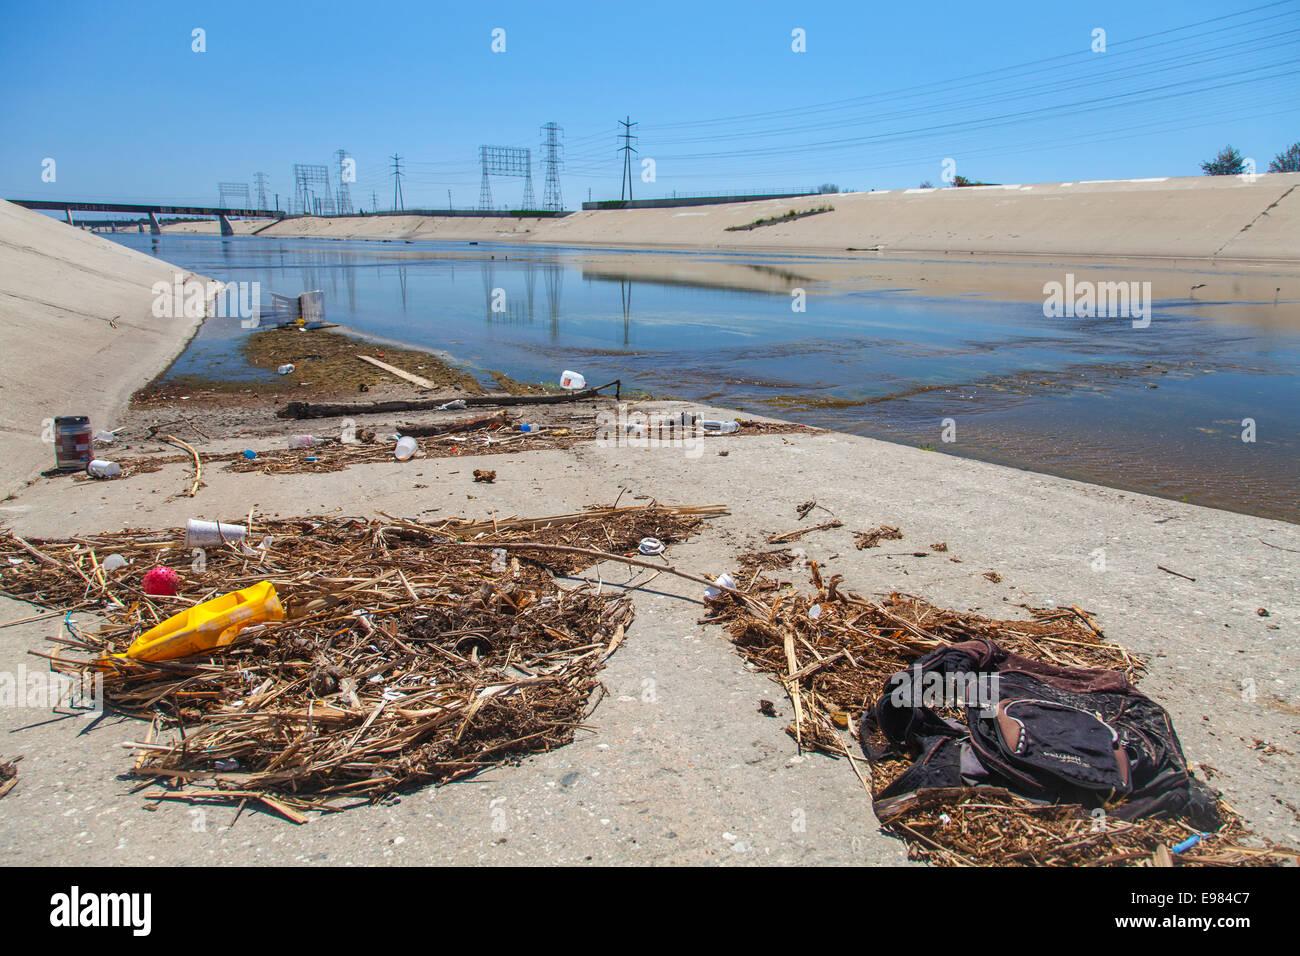 Trash along the banks of Los Angeles River, Long Beach, California, USA - Stock Image